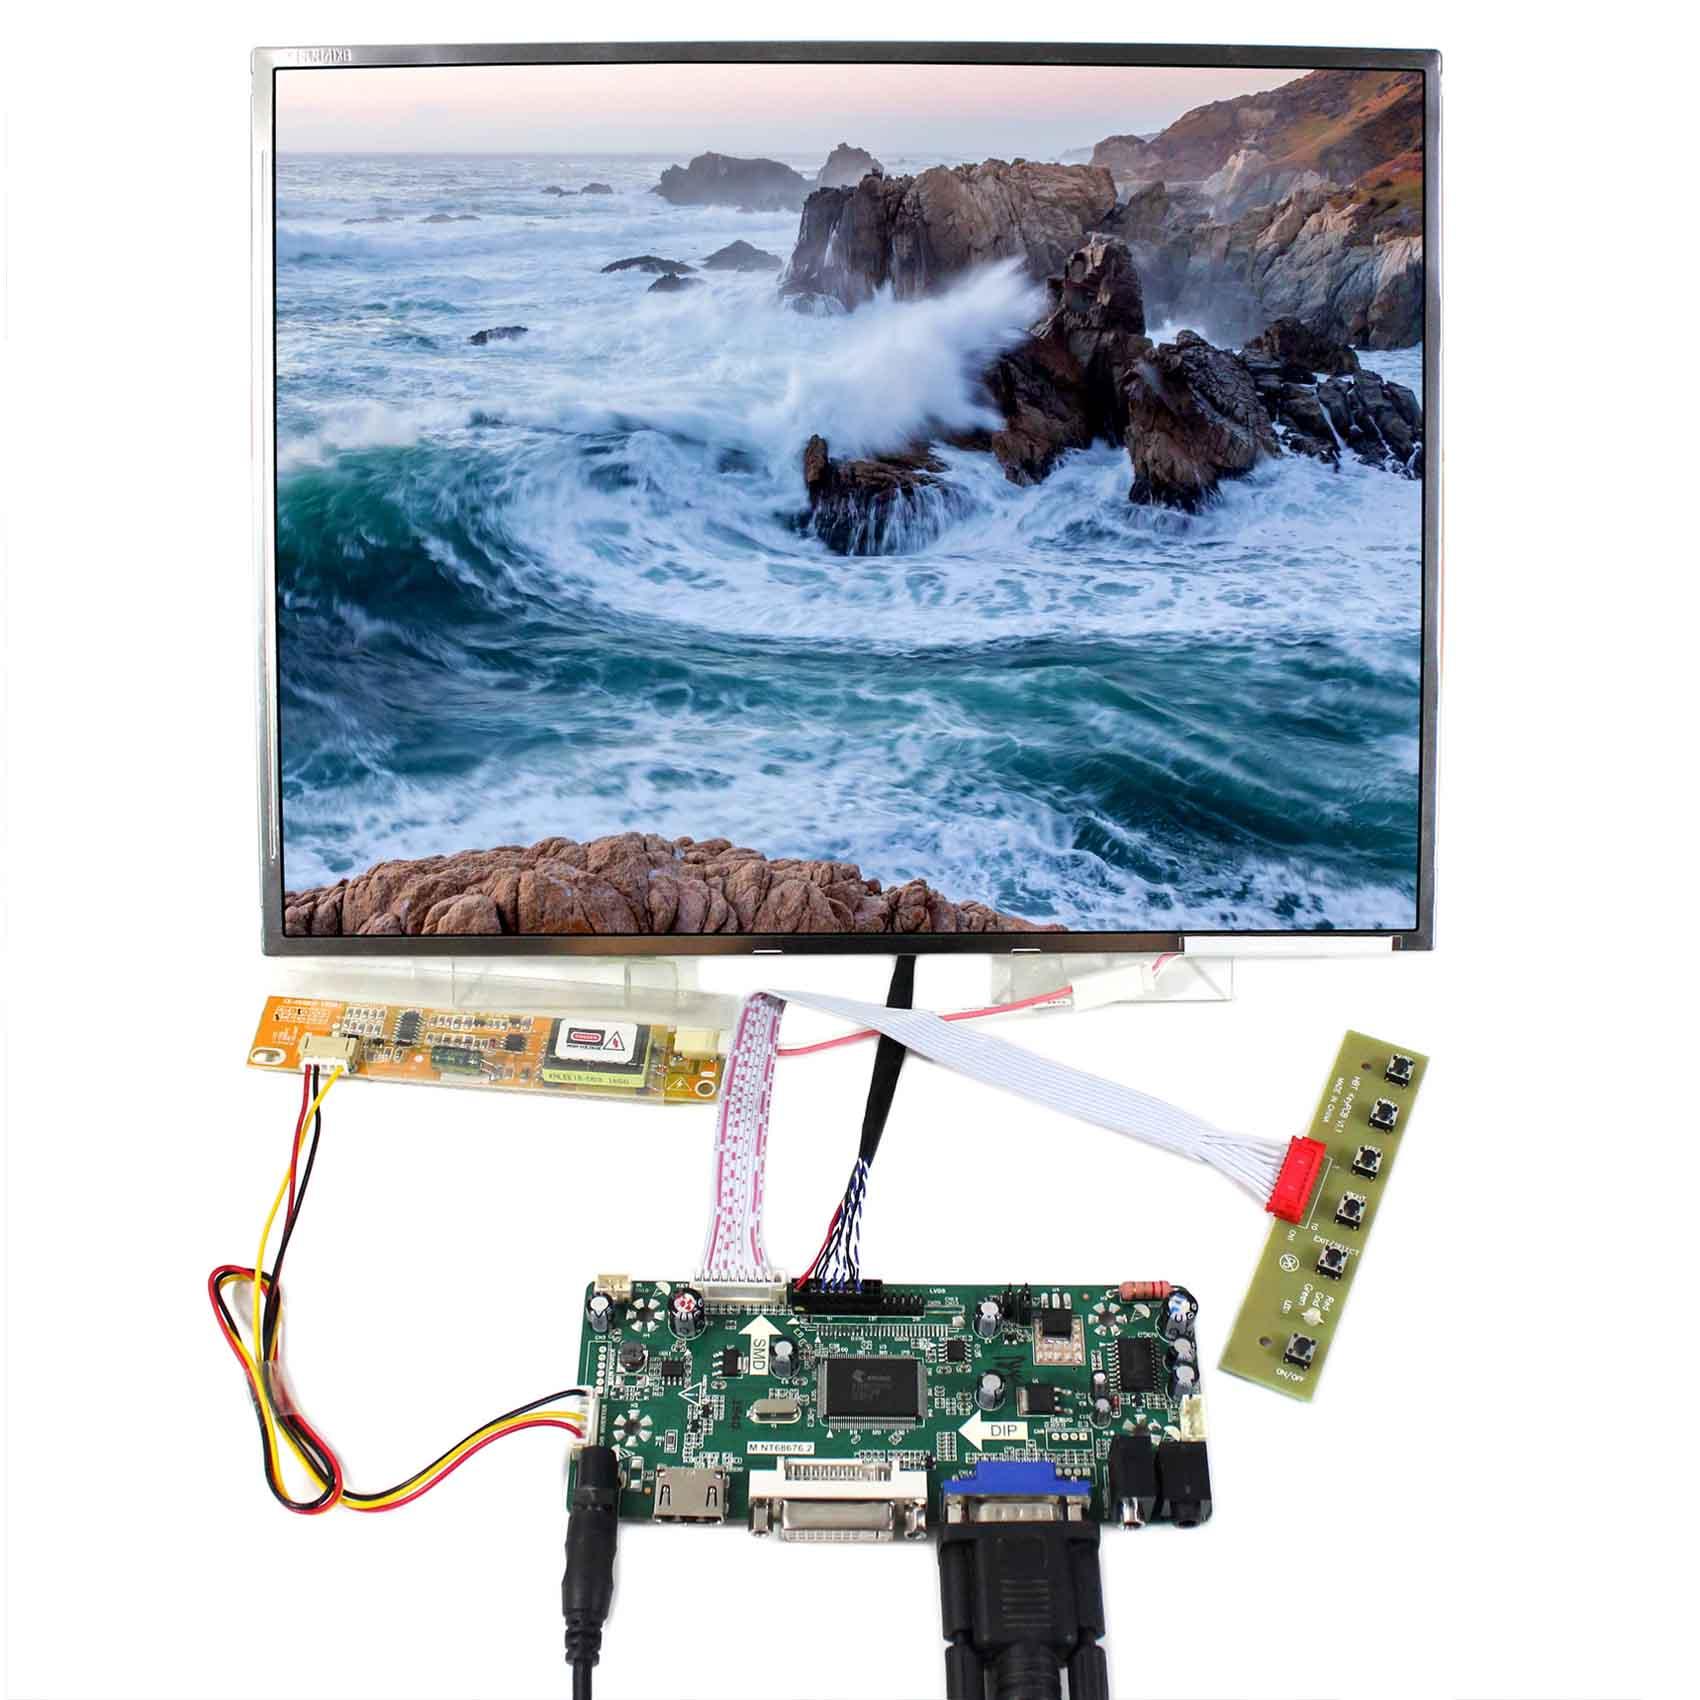 14inch 1024x768 LCD Screen LTN141XF  LTN141X8 N141X6 LP141XA LP141X10 HDMI VGA DVI Audio LCD Controller Board14inch 1024x768 LCD Screen LTN141XF  LTN141X8 N141X6 LP141XA LP141X10 HDMI VGA DVI Audio LCD Controller Board